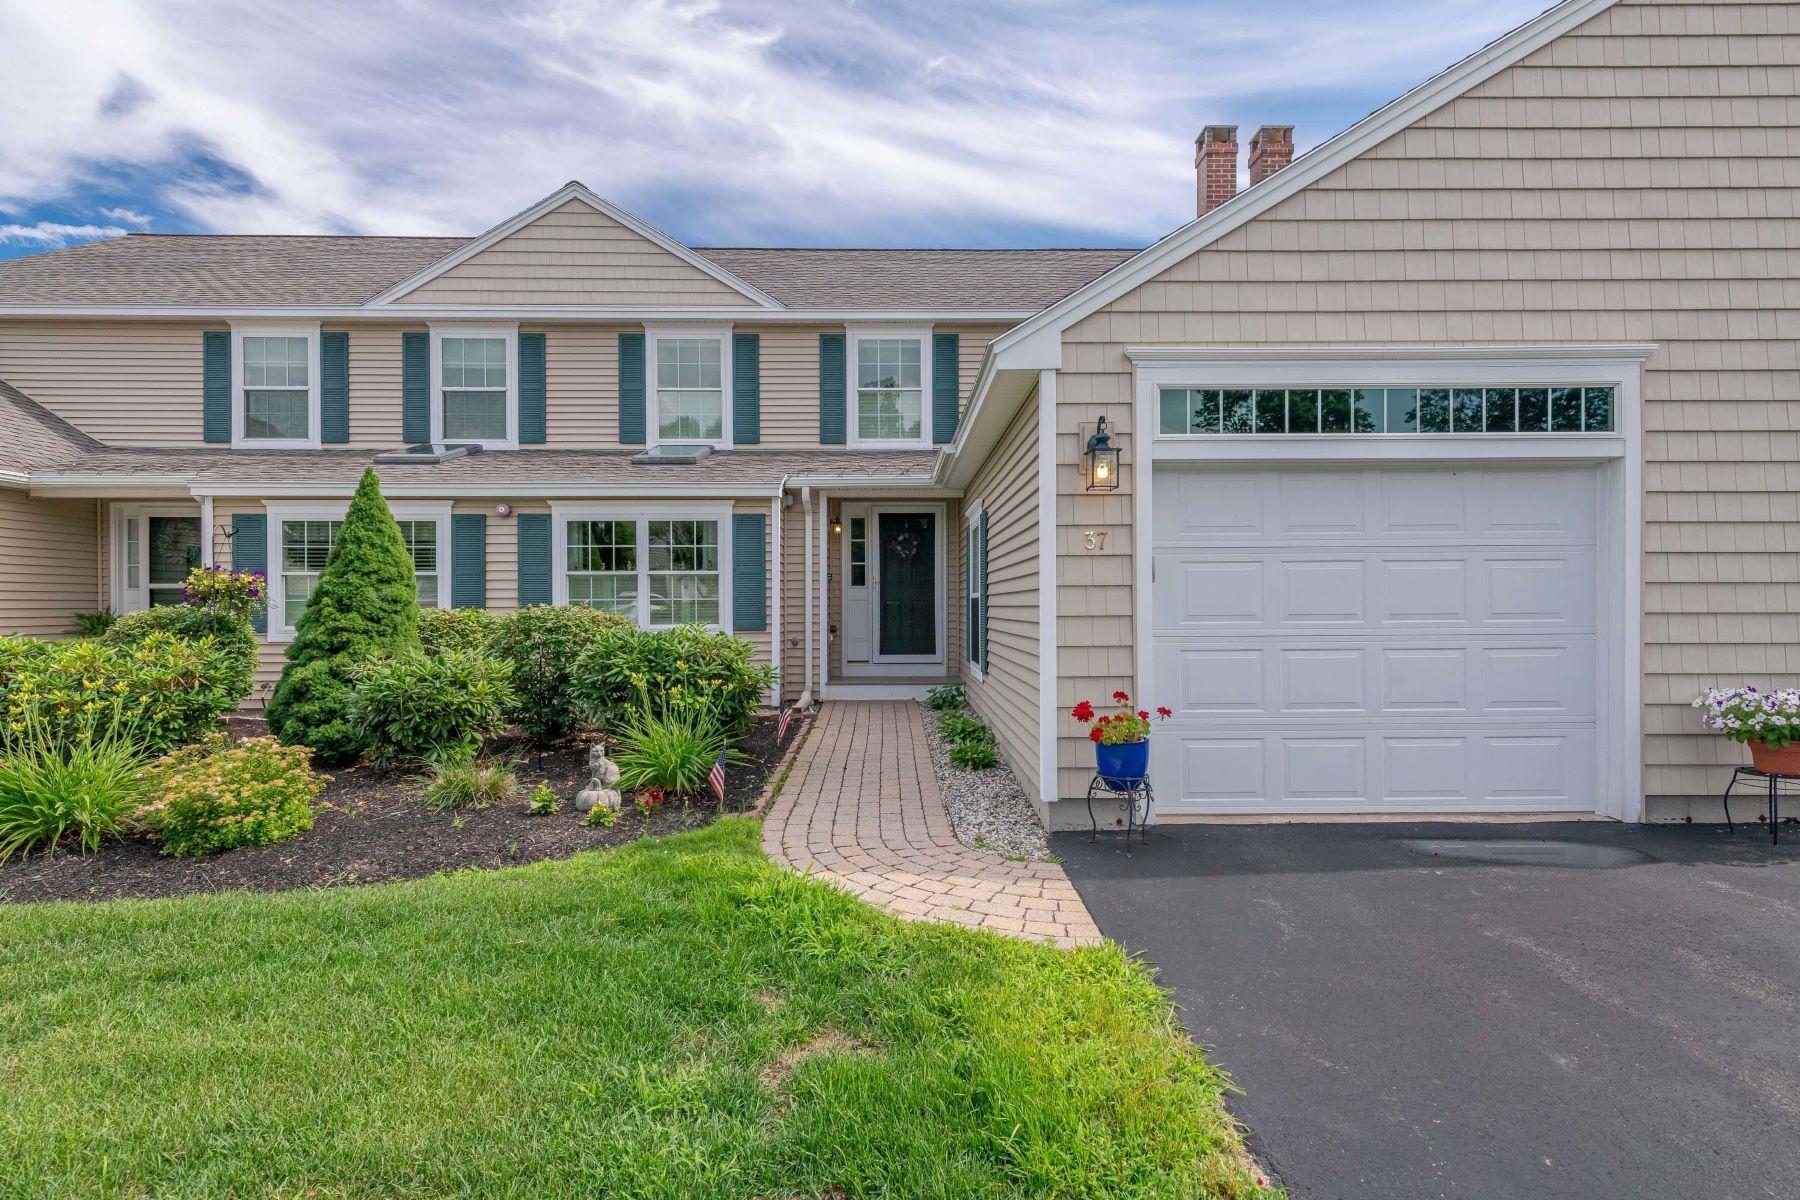 Condominiums for Sale at 37 Ridgefield Drive #42, Gorham, Maine 04038 United States